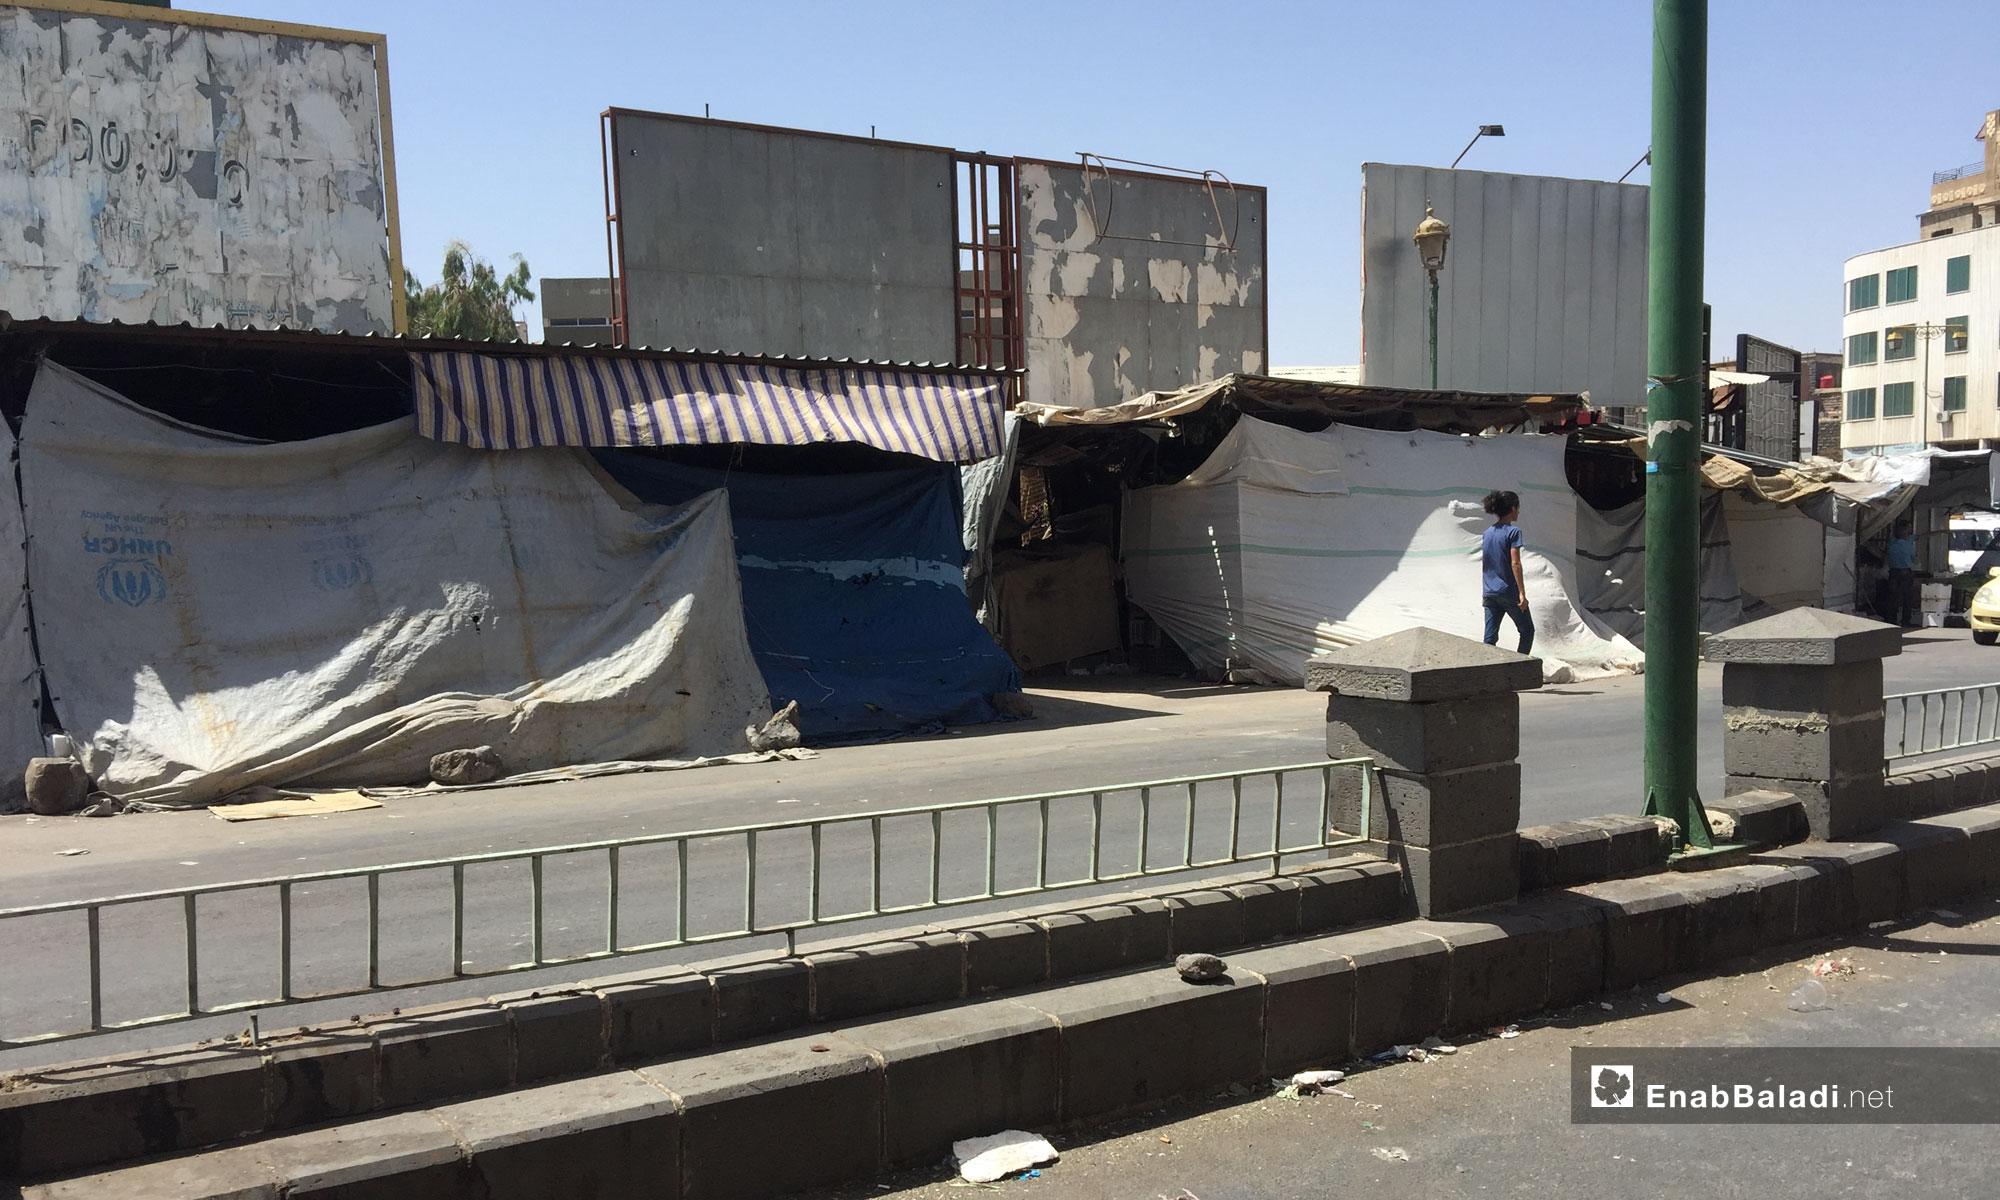 The vegetable market in the city of As-Suwayda – July 27, 2018 (Enab Baladi)